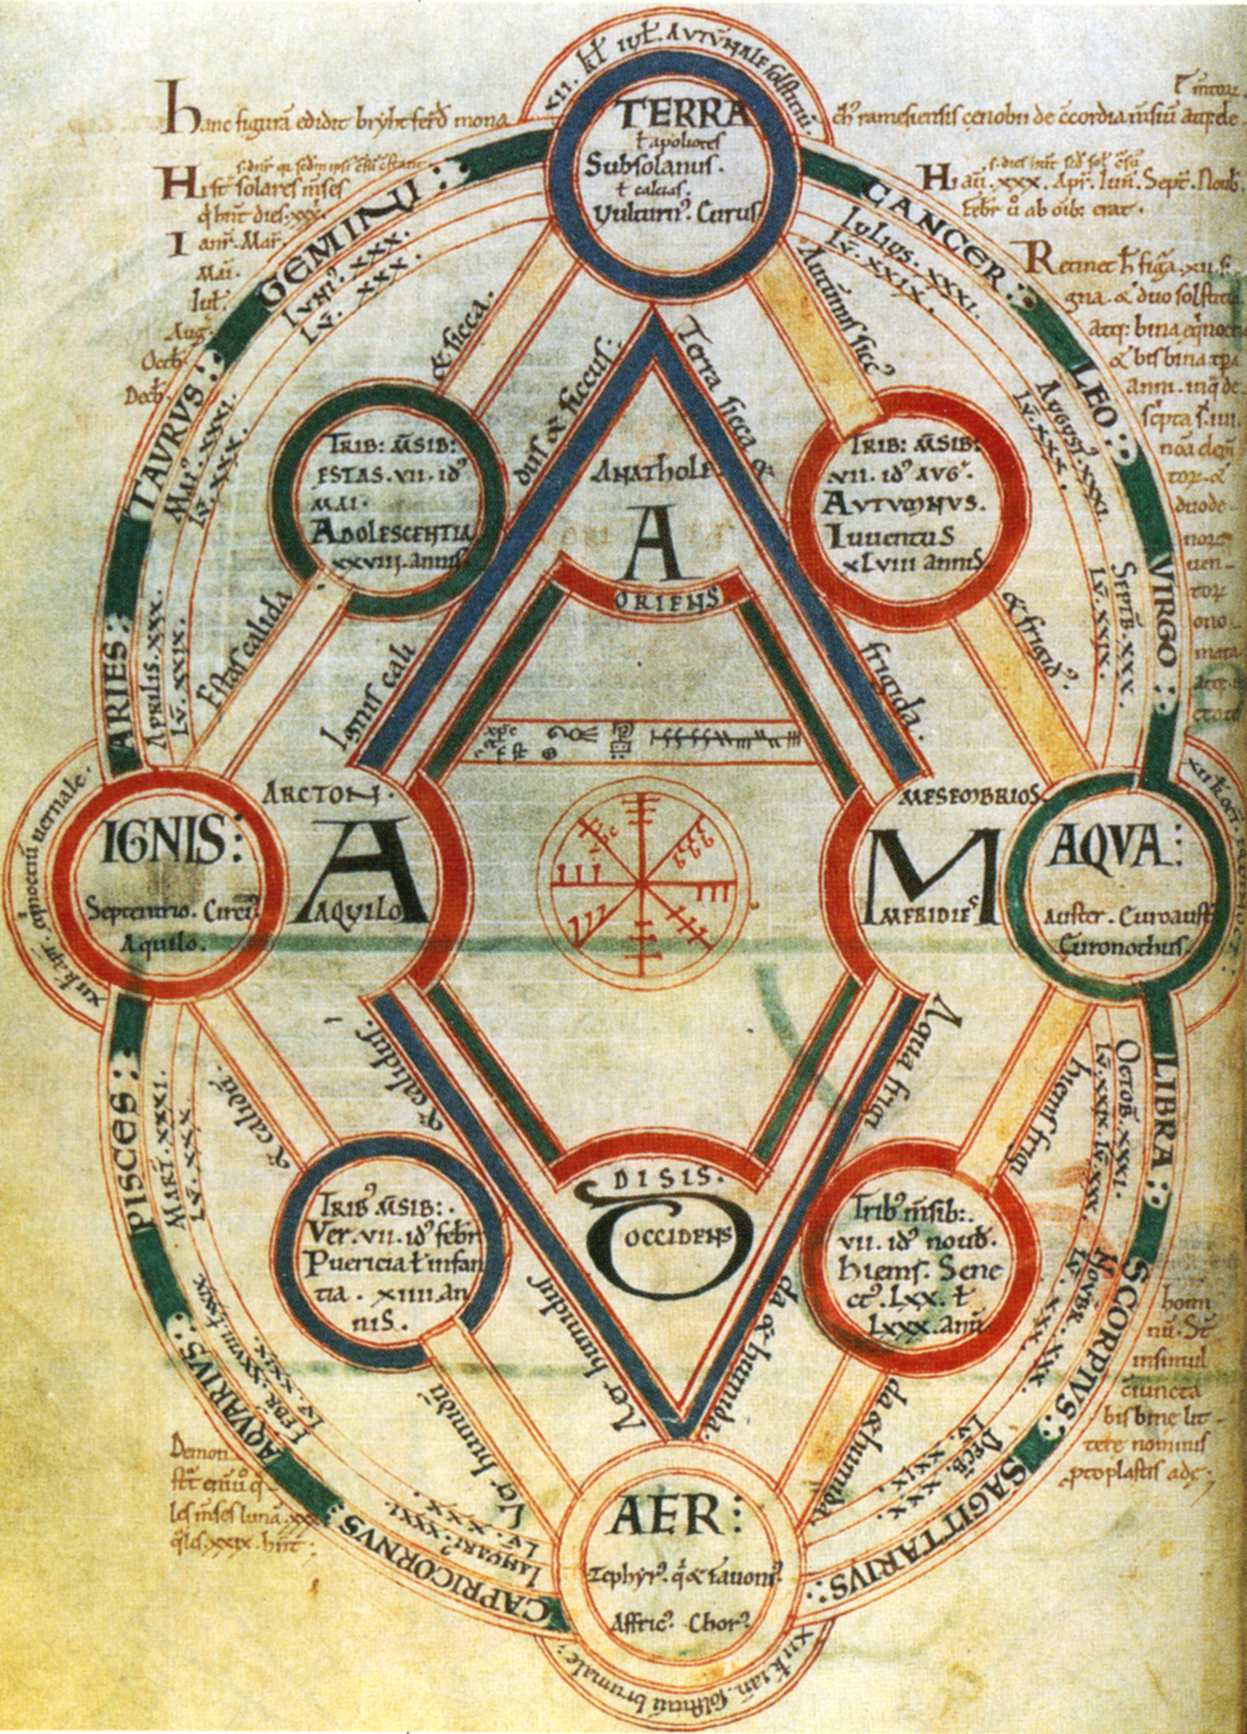 Late 11th century manuscript on the elements, seasons and zodiac (via  Wikimedia )